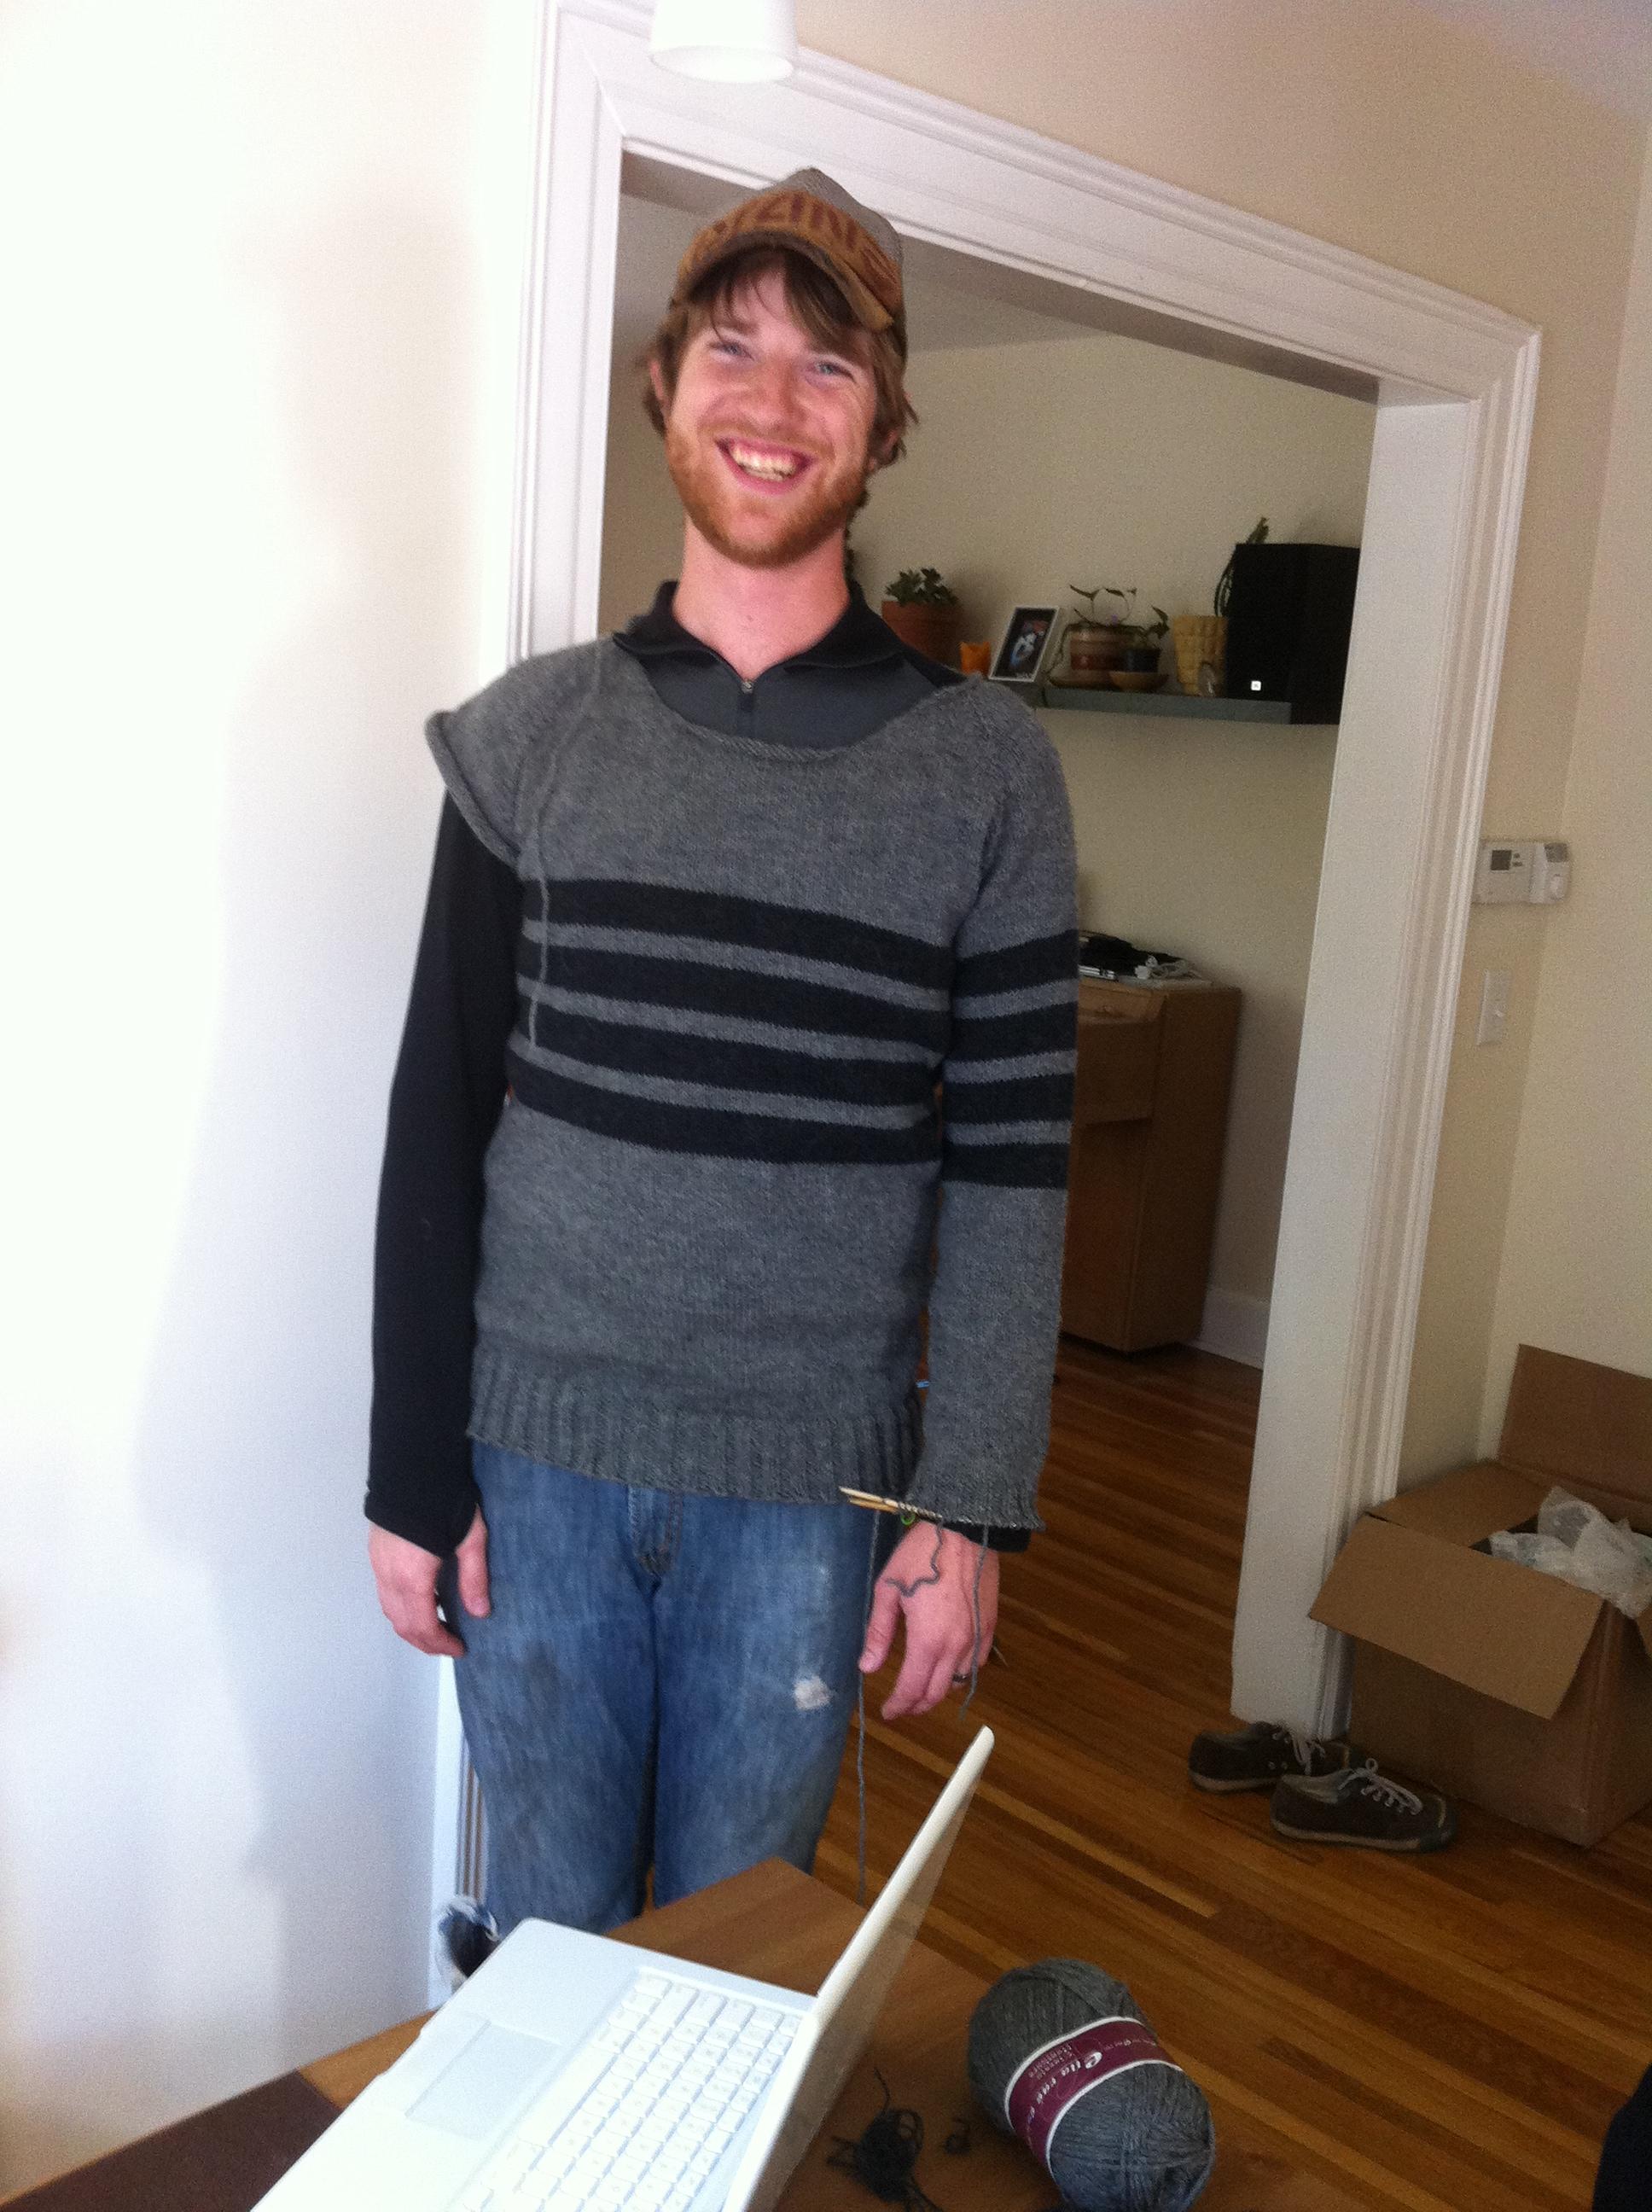 Fall inspires knitting: sweaters, socks, handwarmers, shawls…